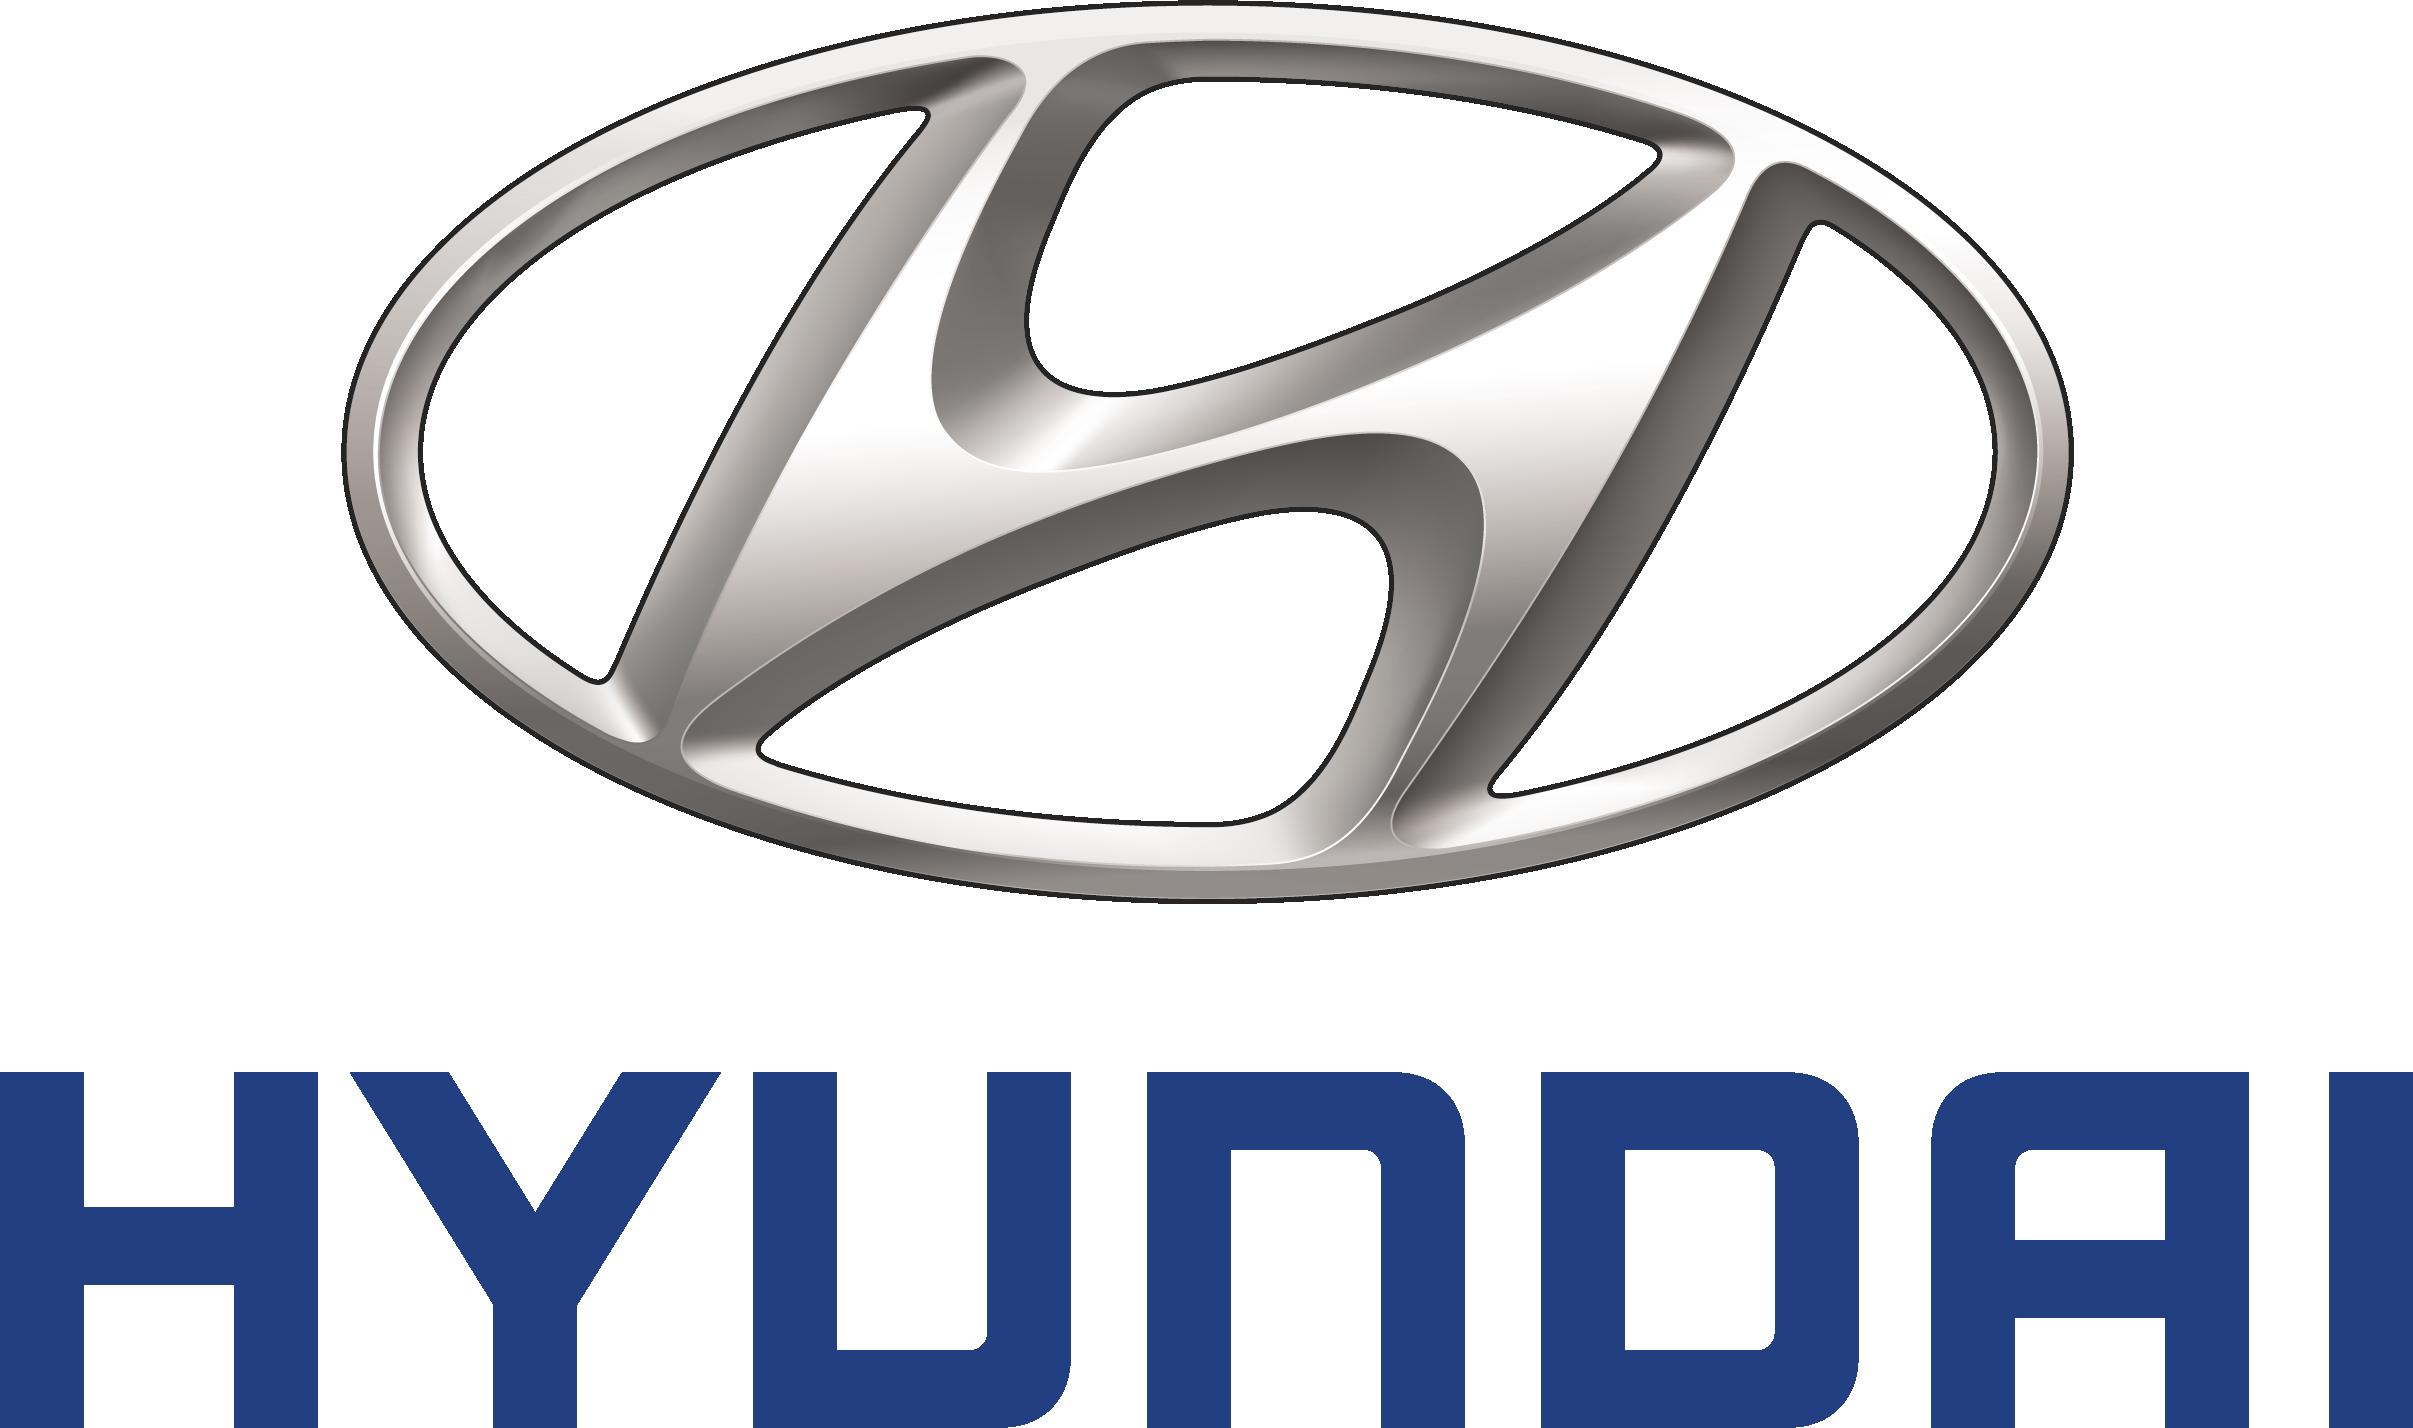 hyundai logo emblem png #340